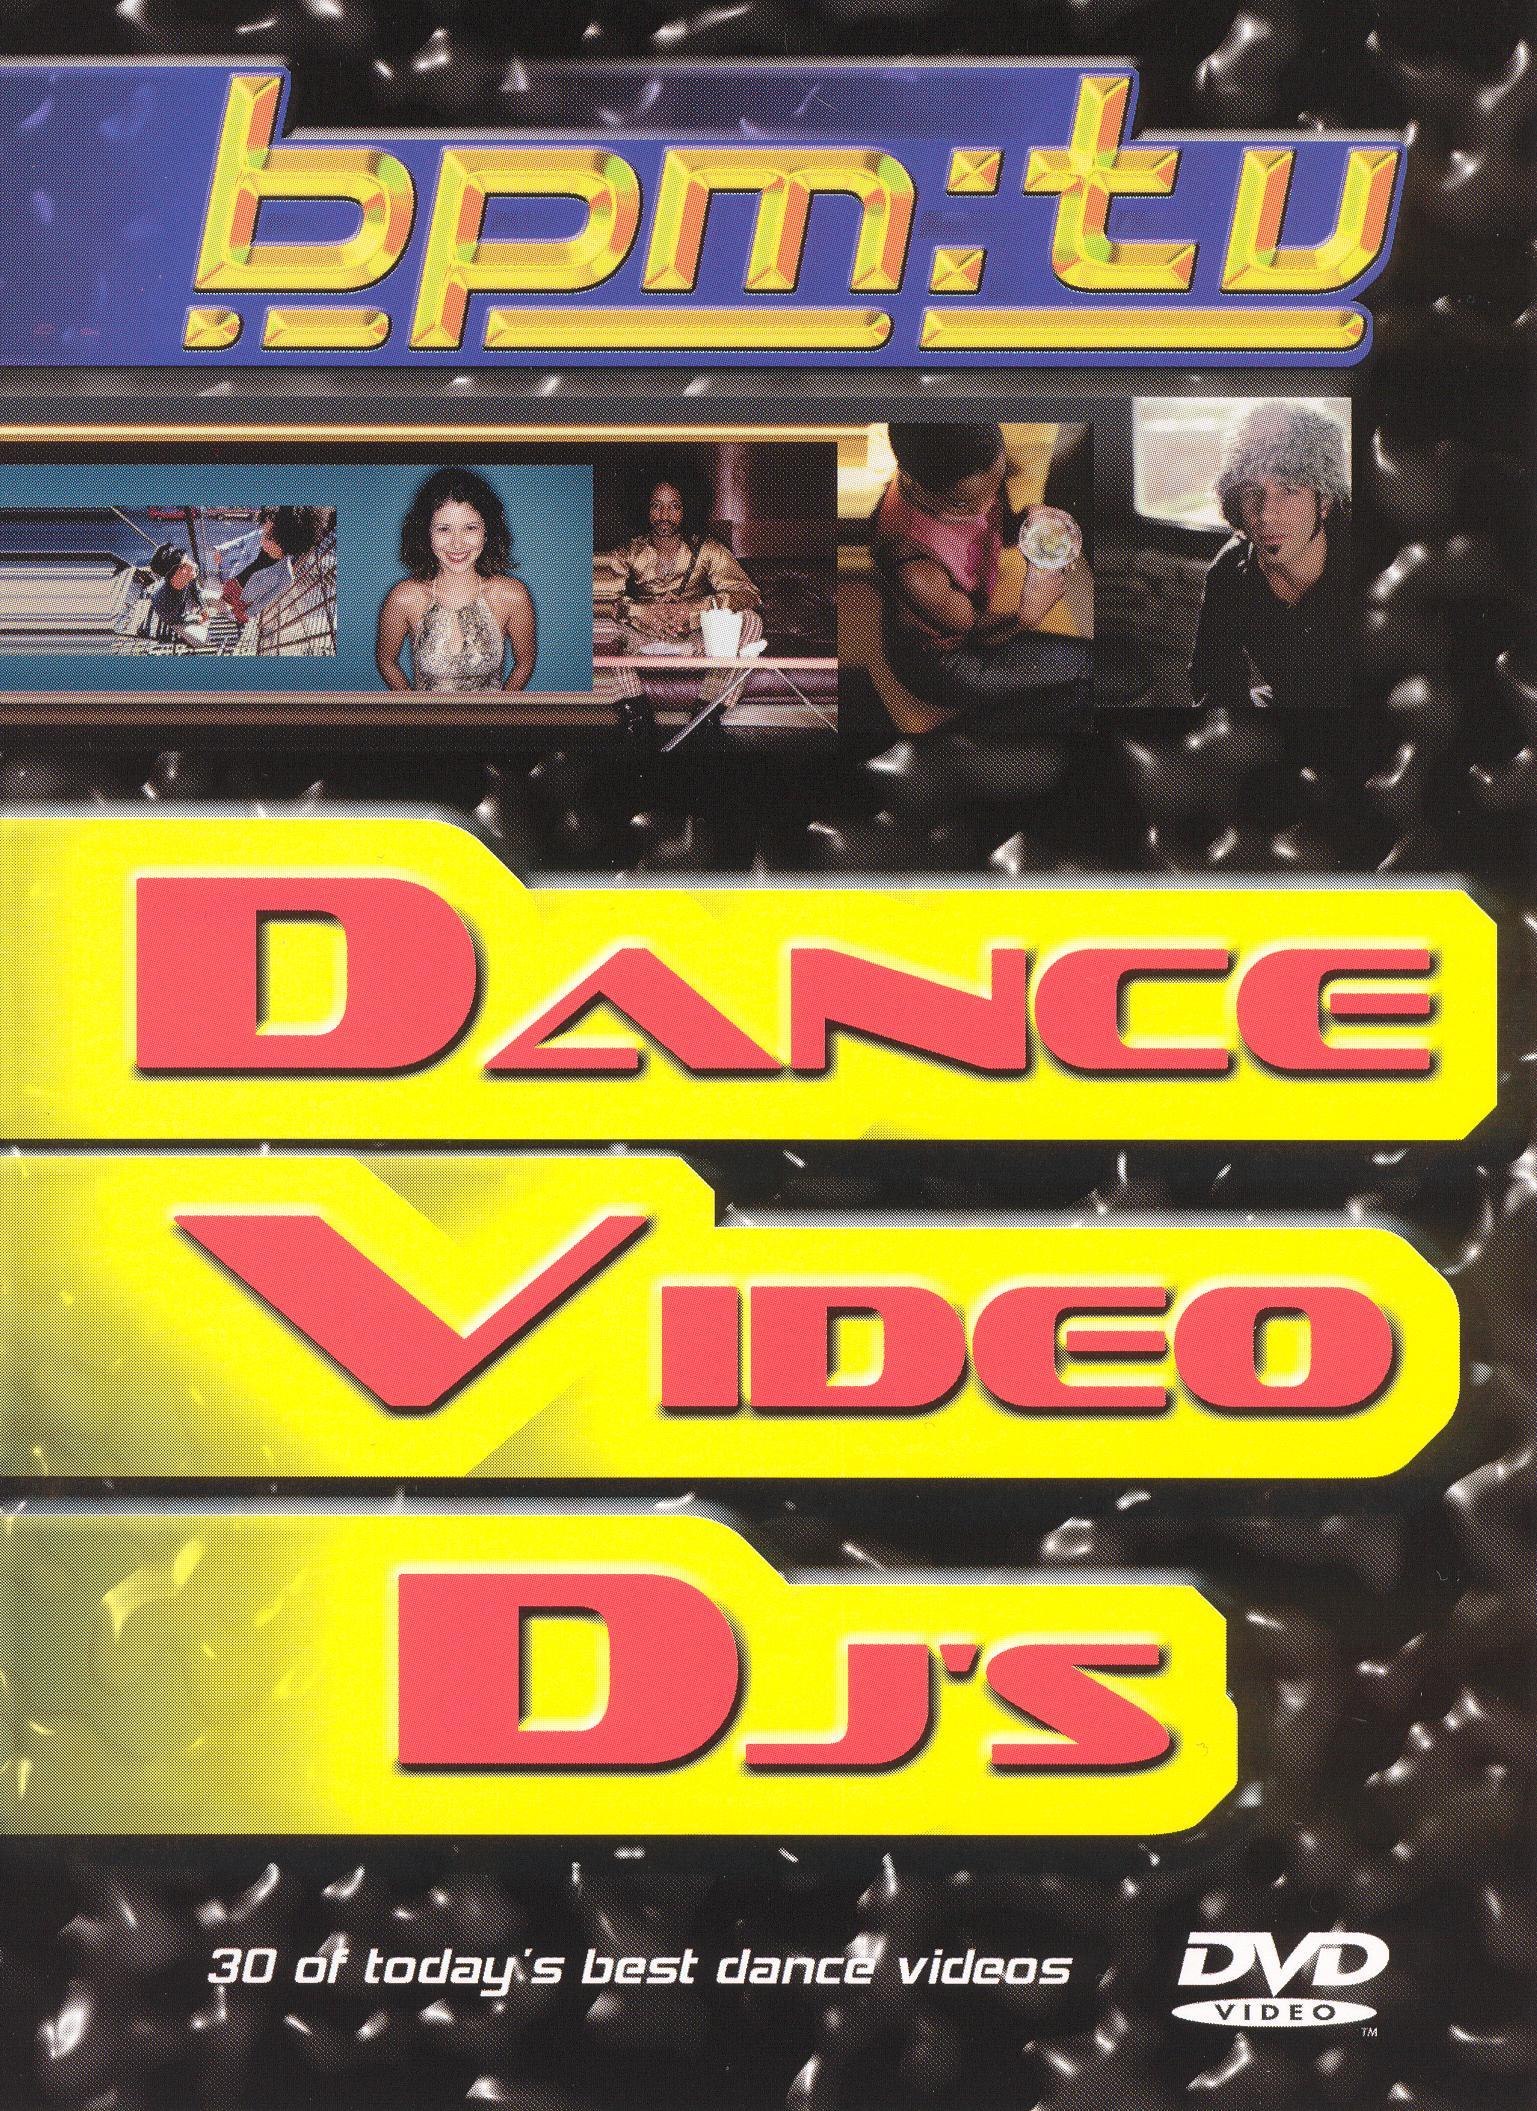 BPM TV: Dance Video DJ's